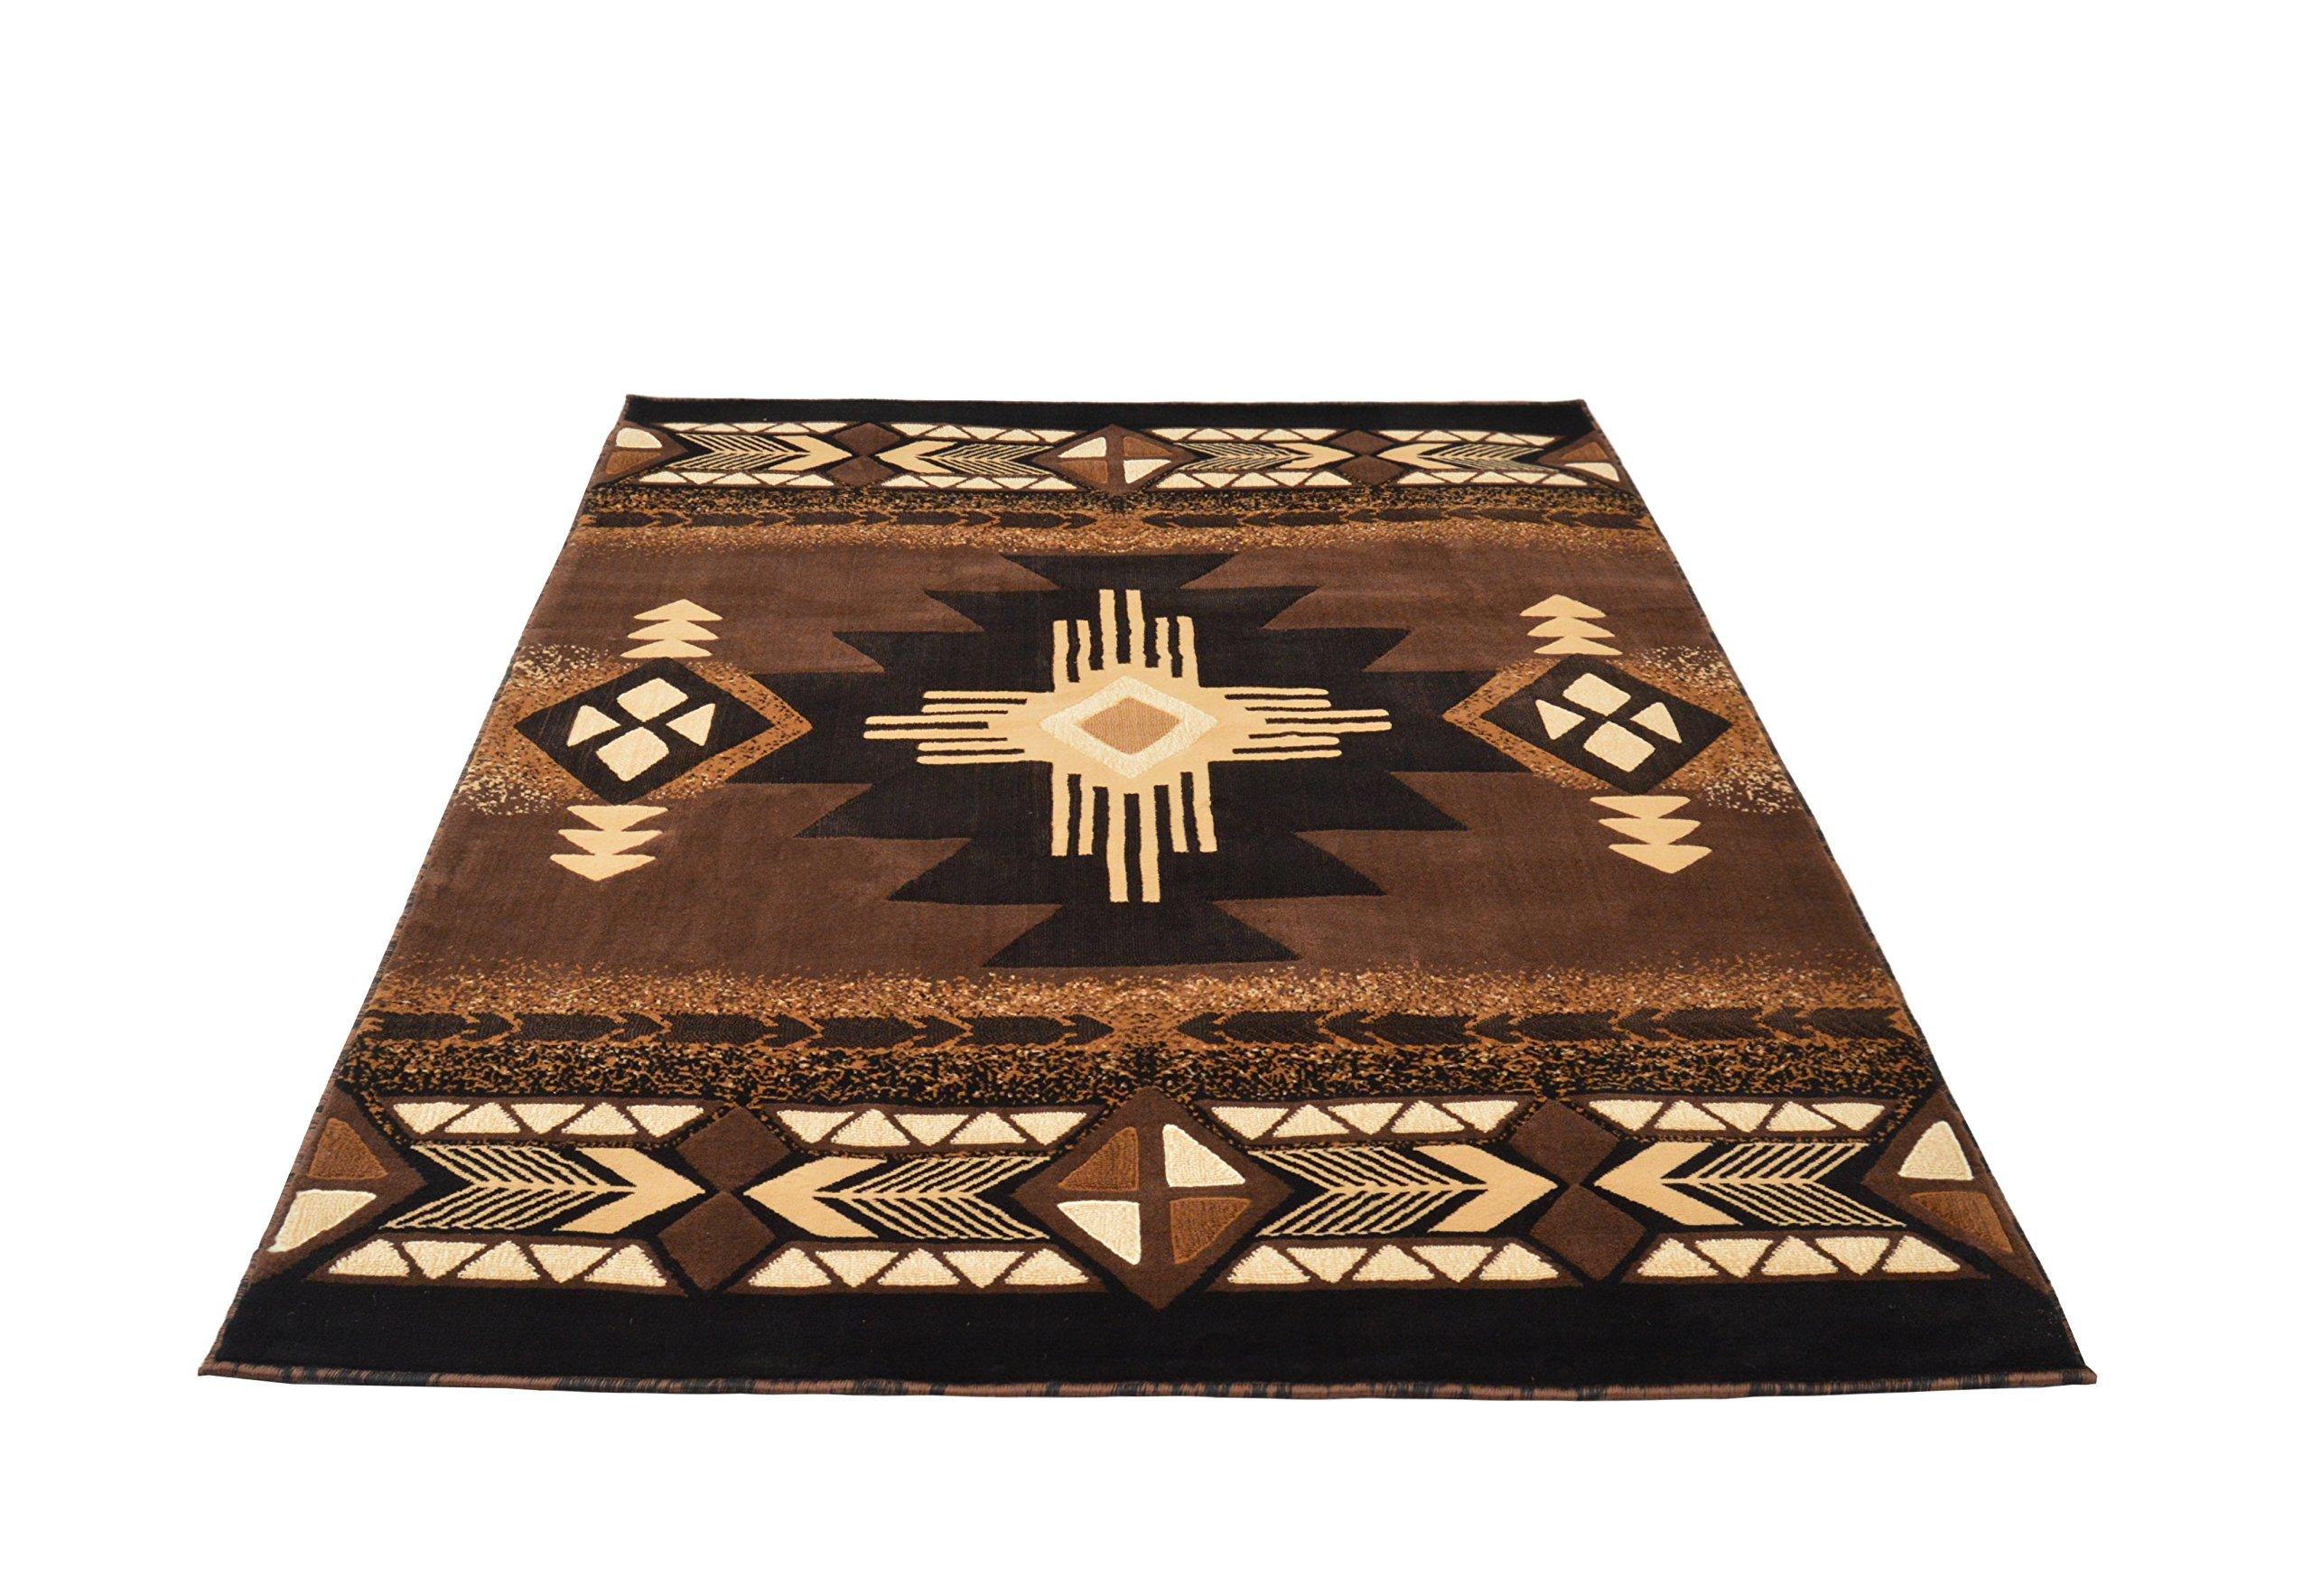 rugs 4 less collection southwest native american indian area rug design r4l 318 617762575846 ebay. Black Bedroom Furniture Sets. Home Design Ideas